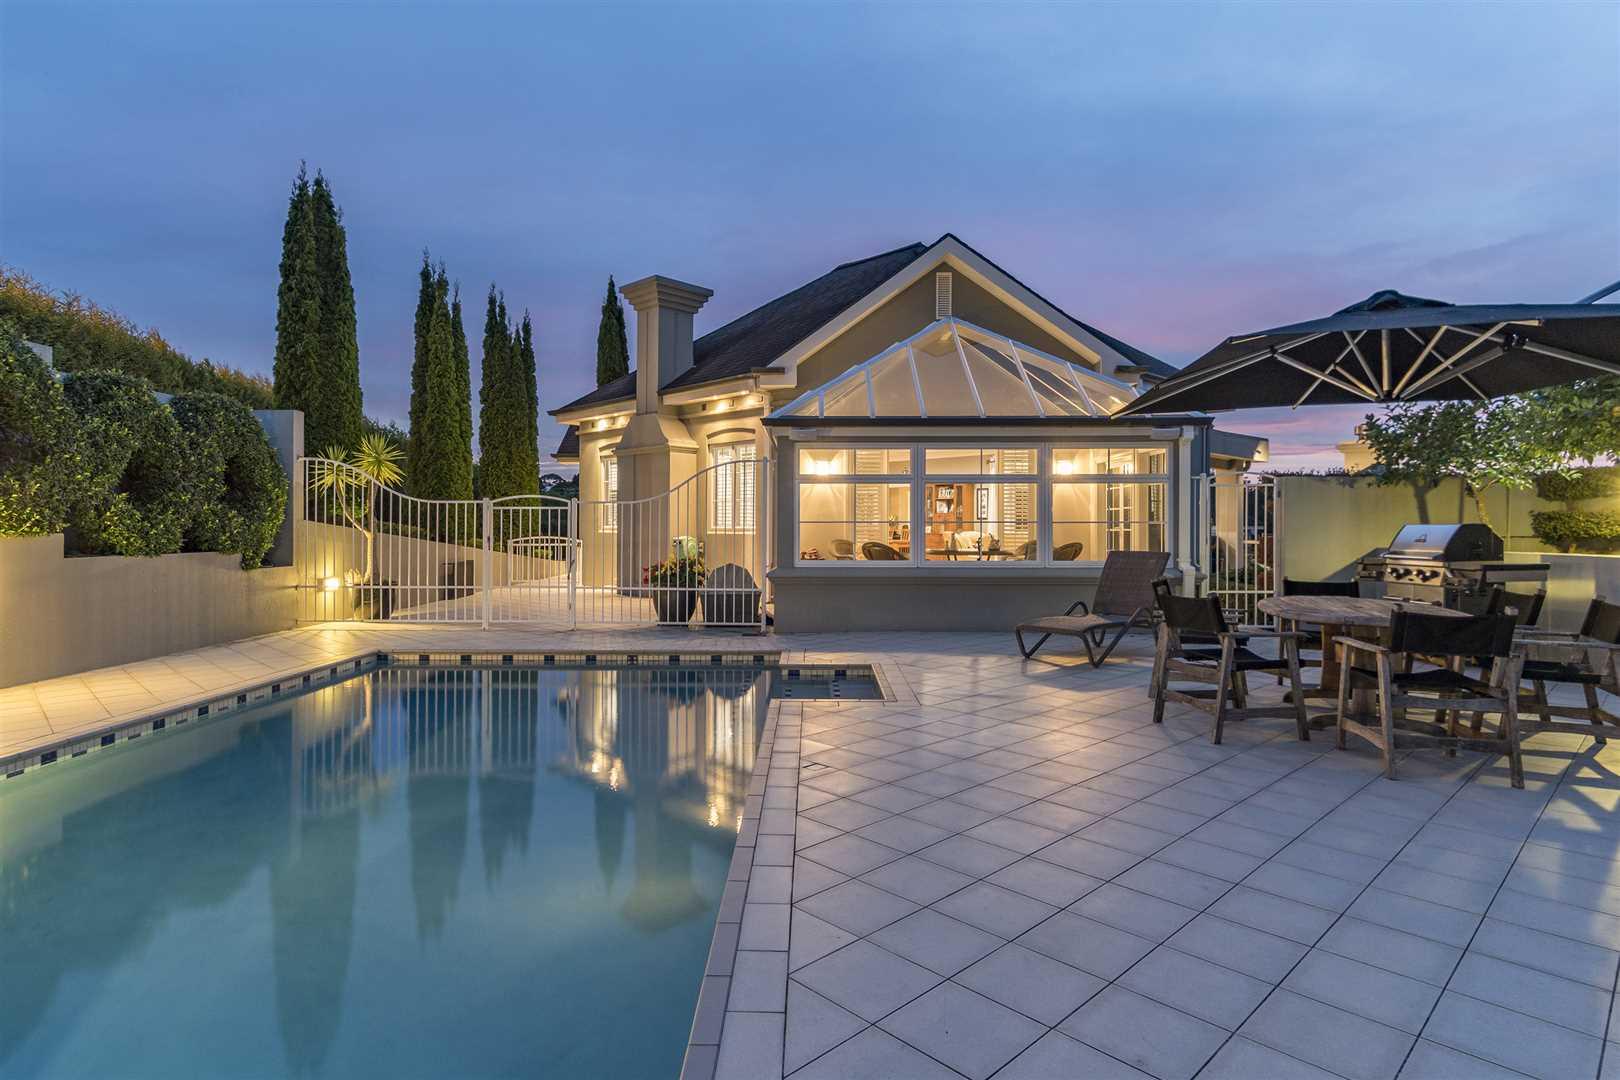 Luxury Country Style - Tauriko